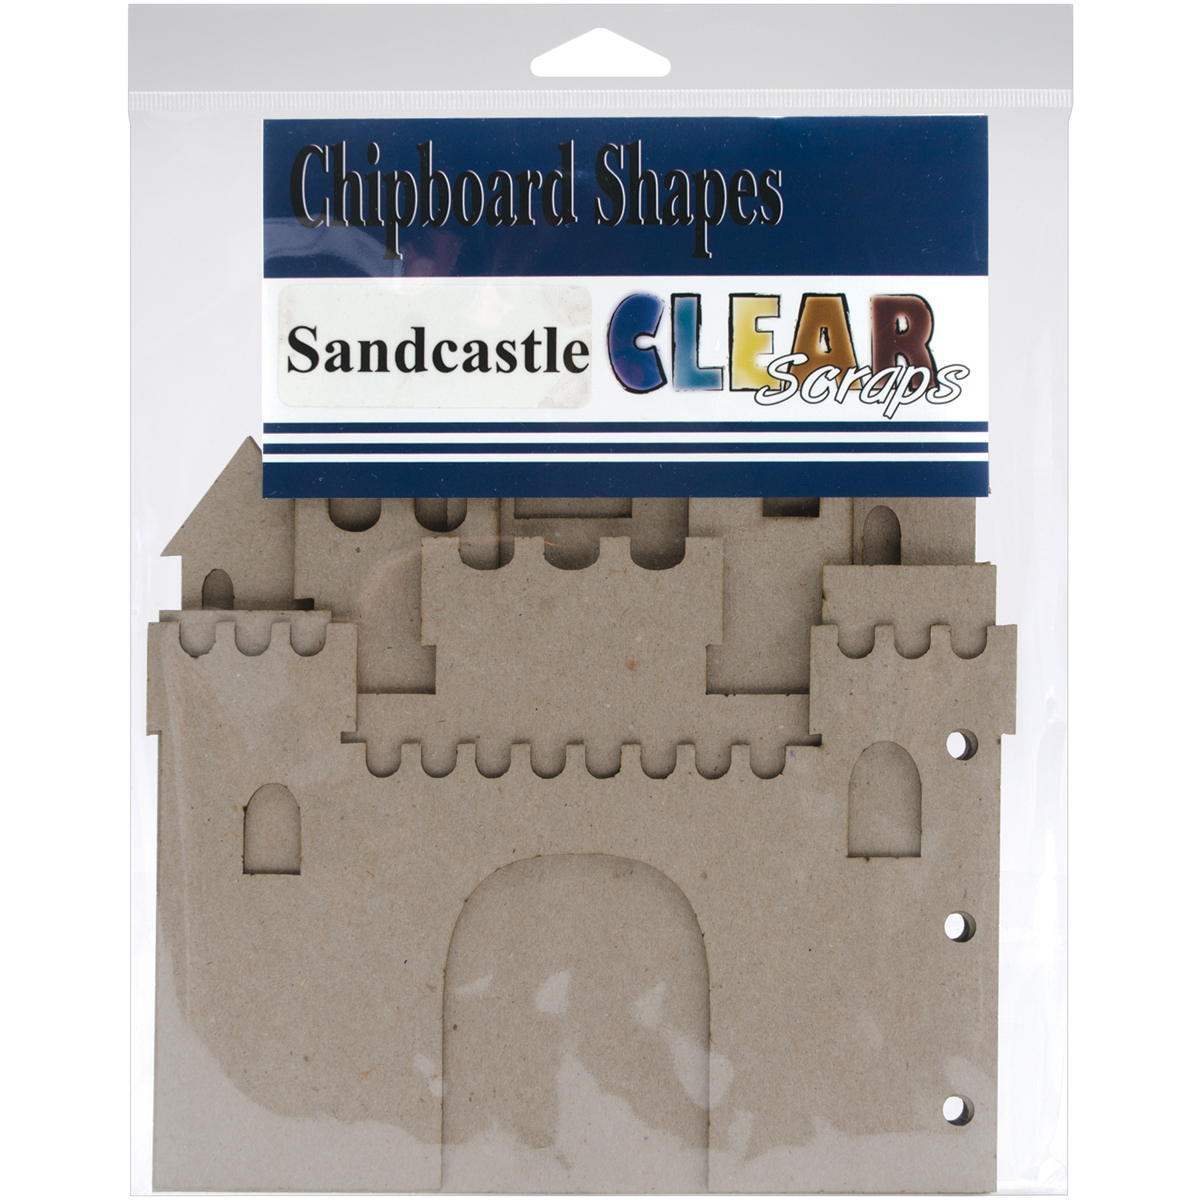 Clear Scraps Sandcastle Chipboard Album 7X9-W/5 Pages & No Rings